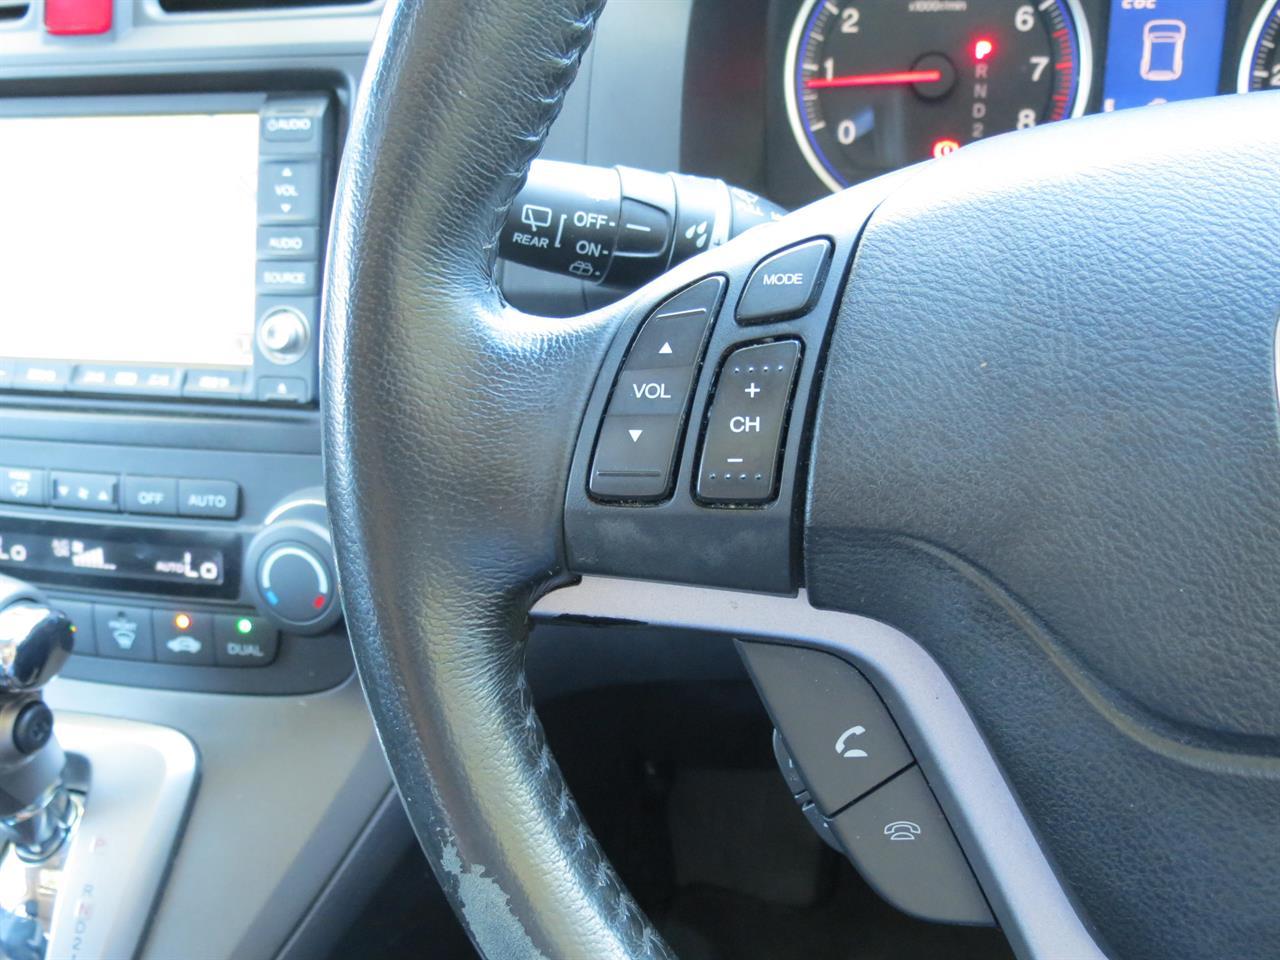 2010 Honda CR-V | only $45 weekly